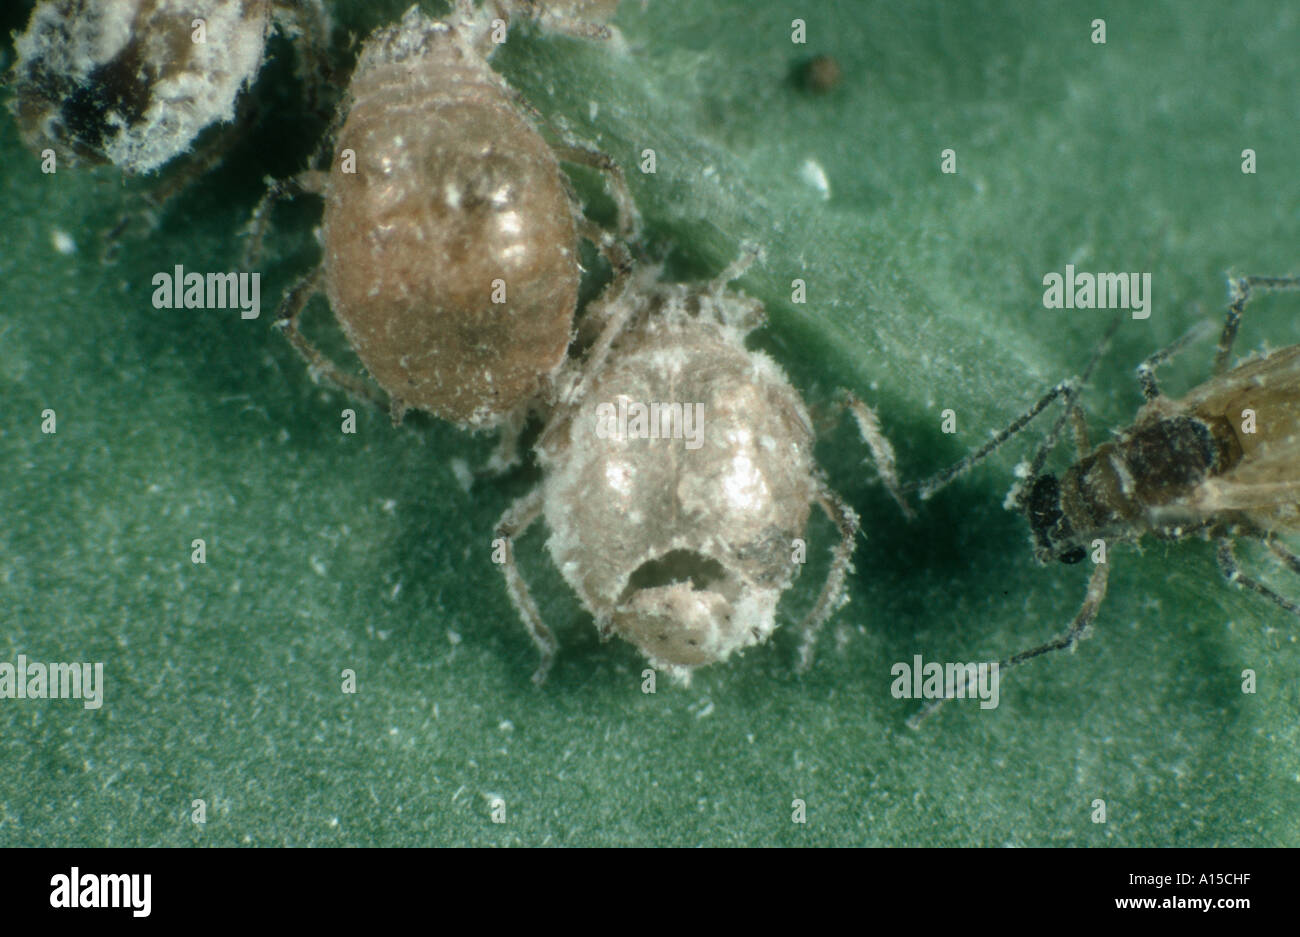 Aphid Brevicoryne brassicae mummy parasitised by Diaeretiella rapae with exit hole - Stock Image